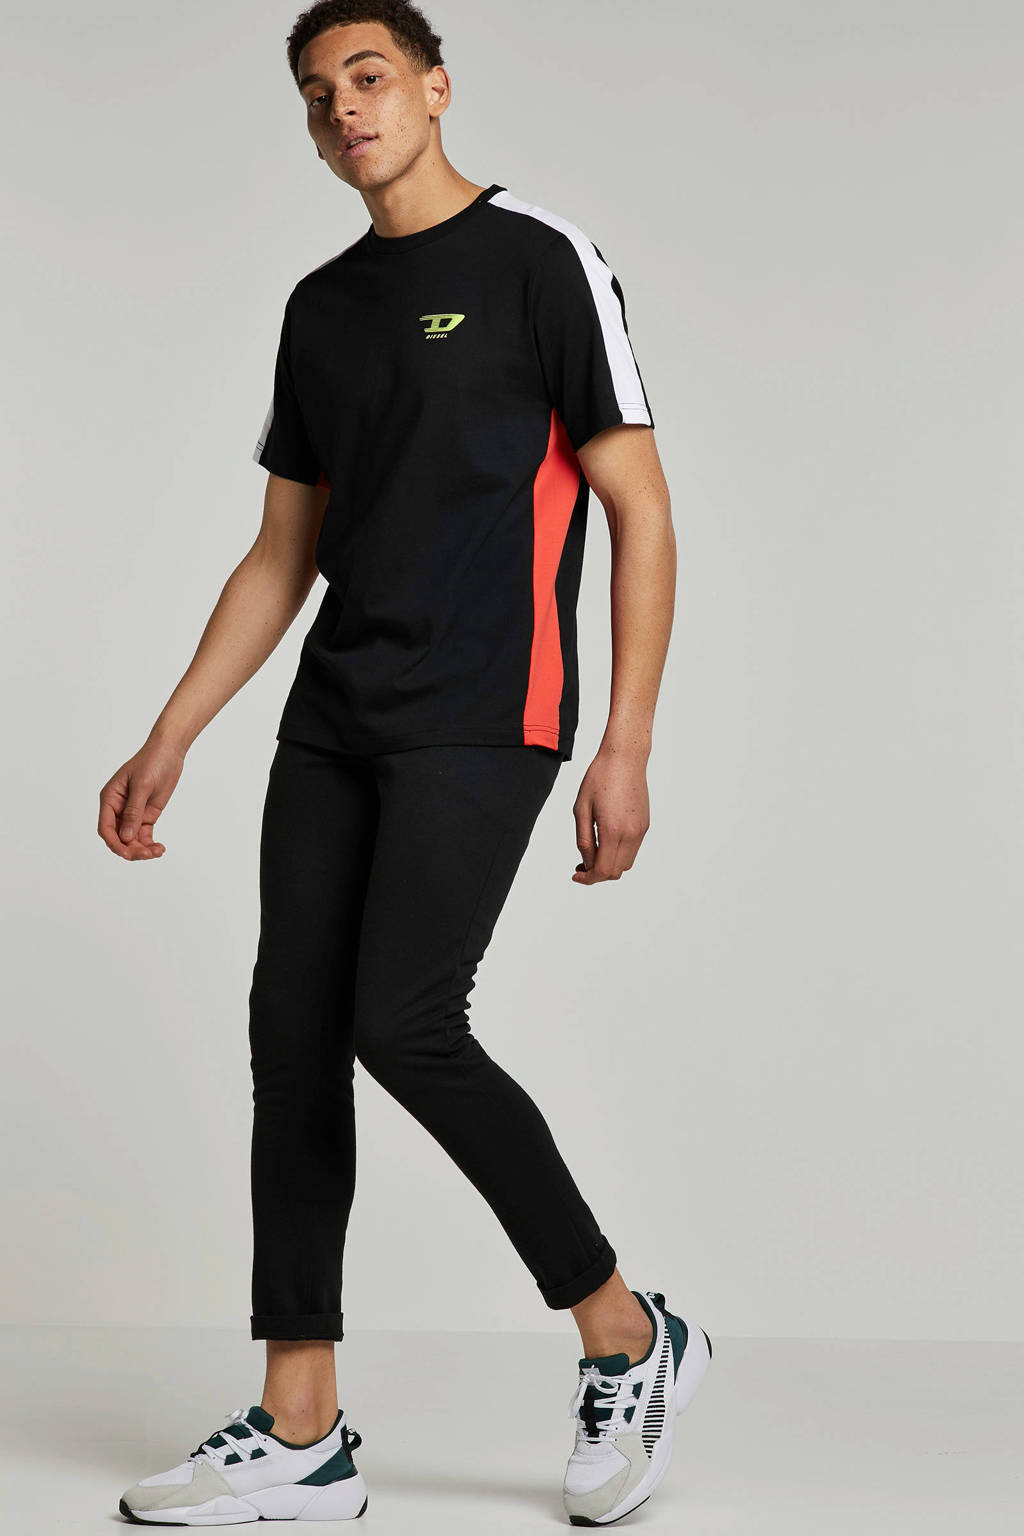 Diesel T-shirt met logo, Zwart/rood/wit